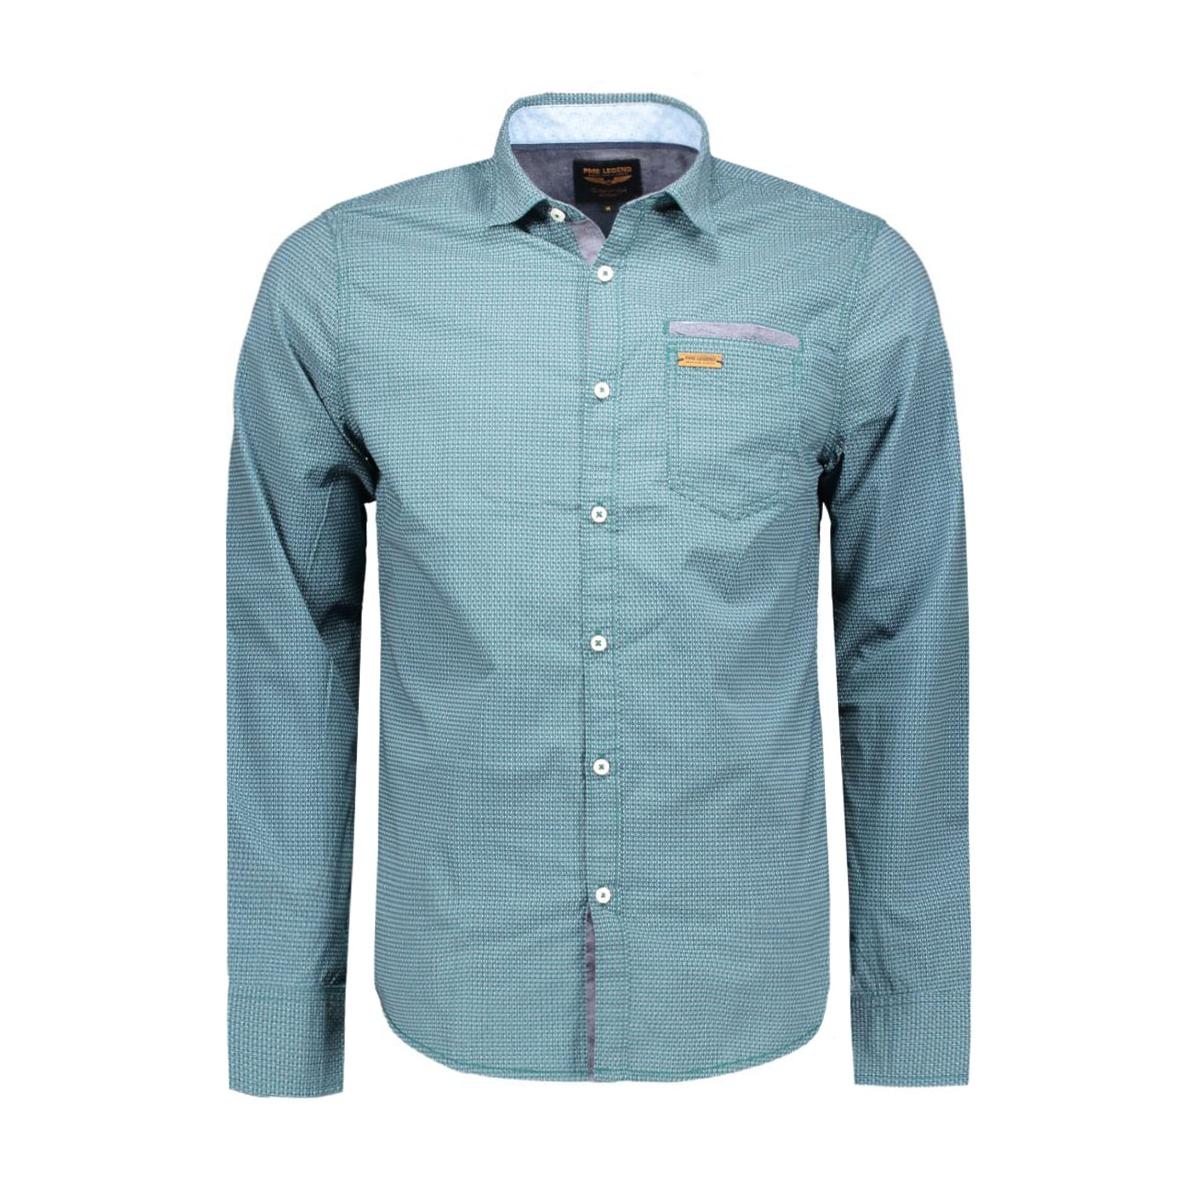 psi66244 pme legend overhemd 6499